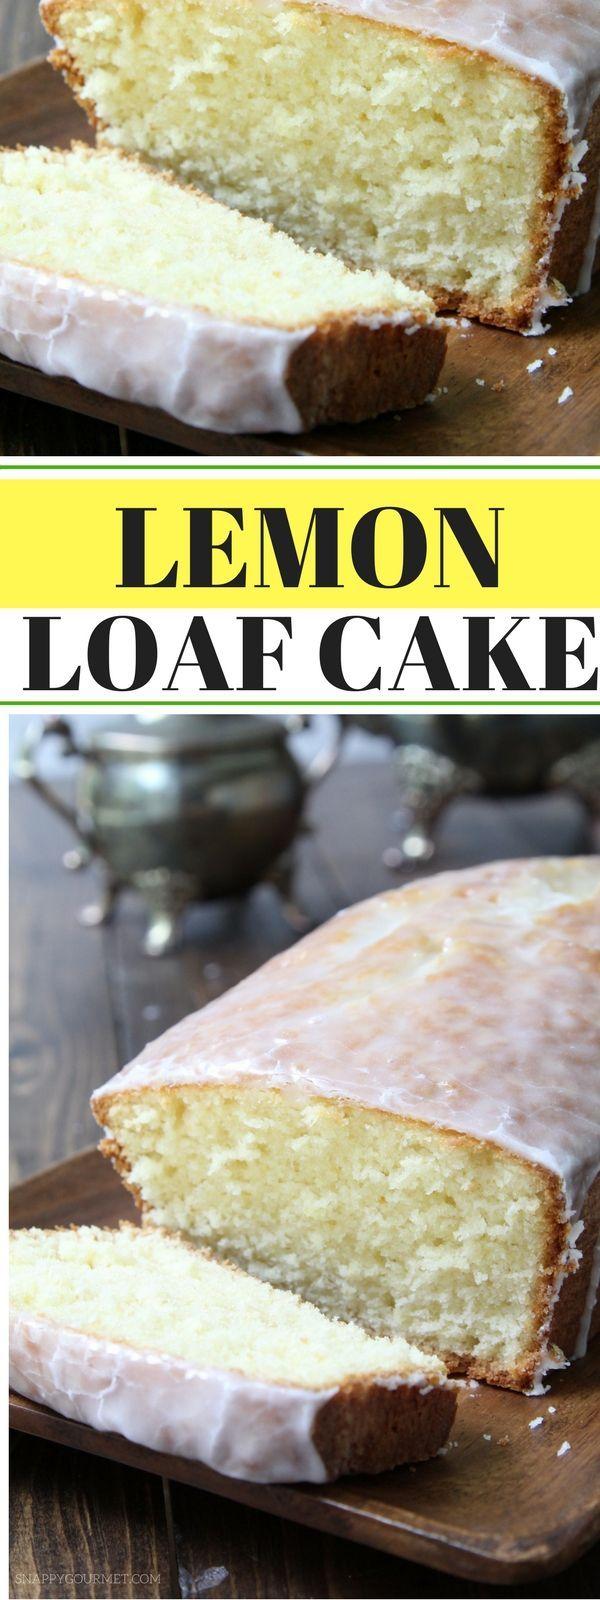 Lemon Loaf Cake - the best lemon cake recipe with an easy glaze just like a copycat of Starbucks lemon cake! SnappyGourmet.com